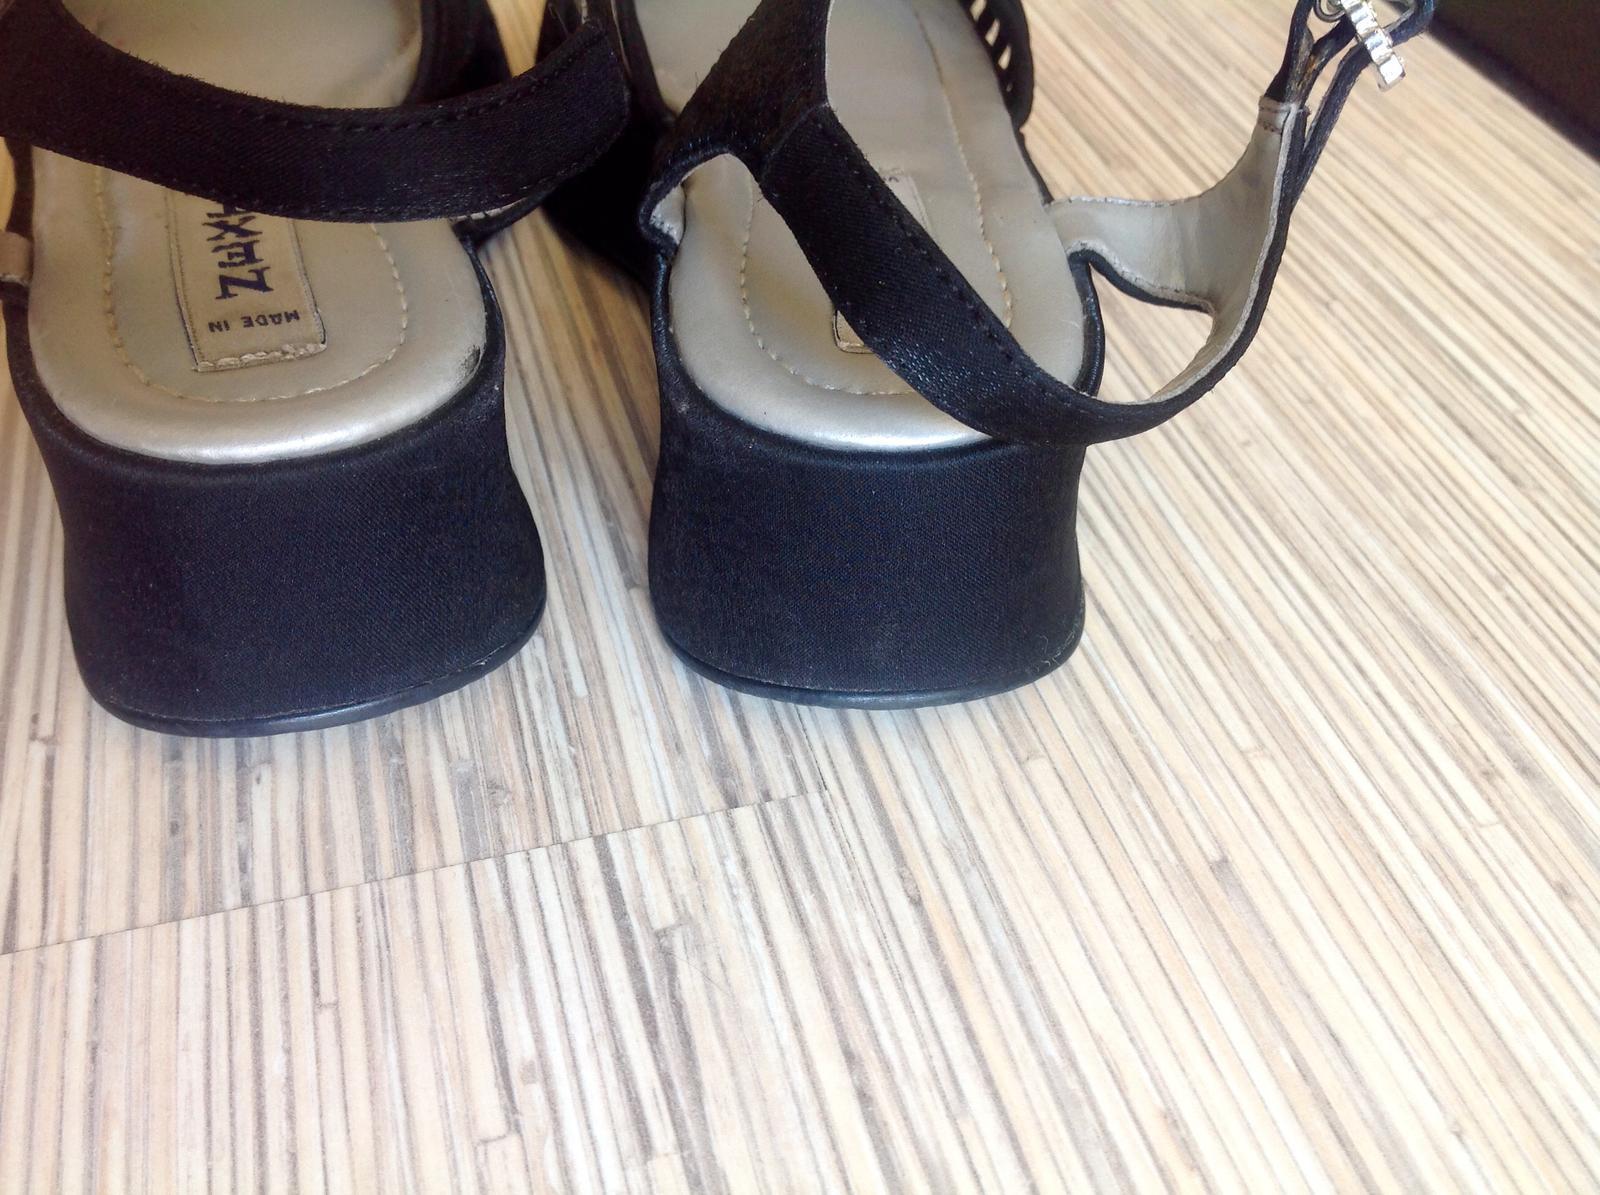 Satenove sandalky next - Obrázok č. 4